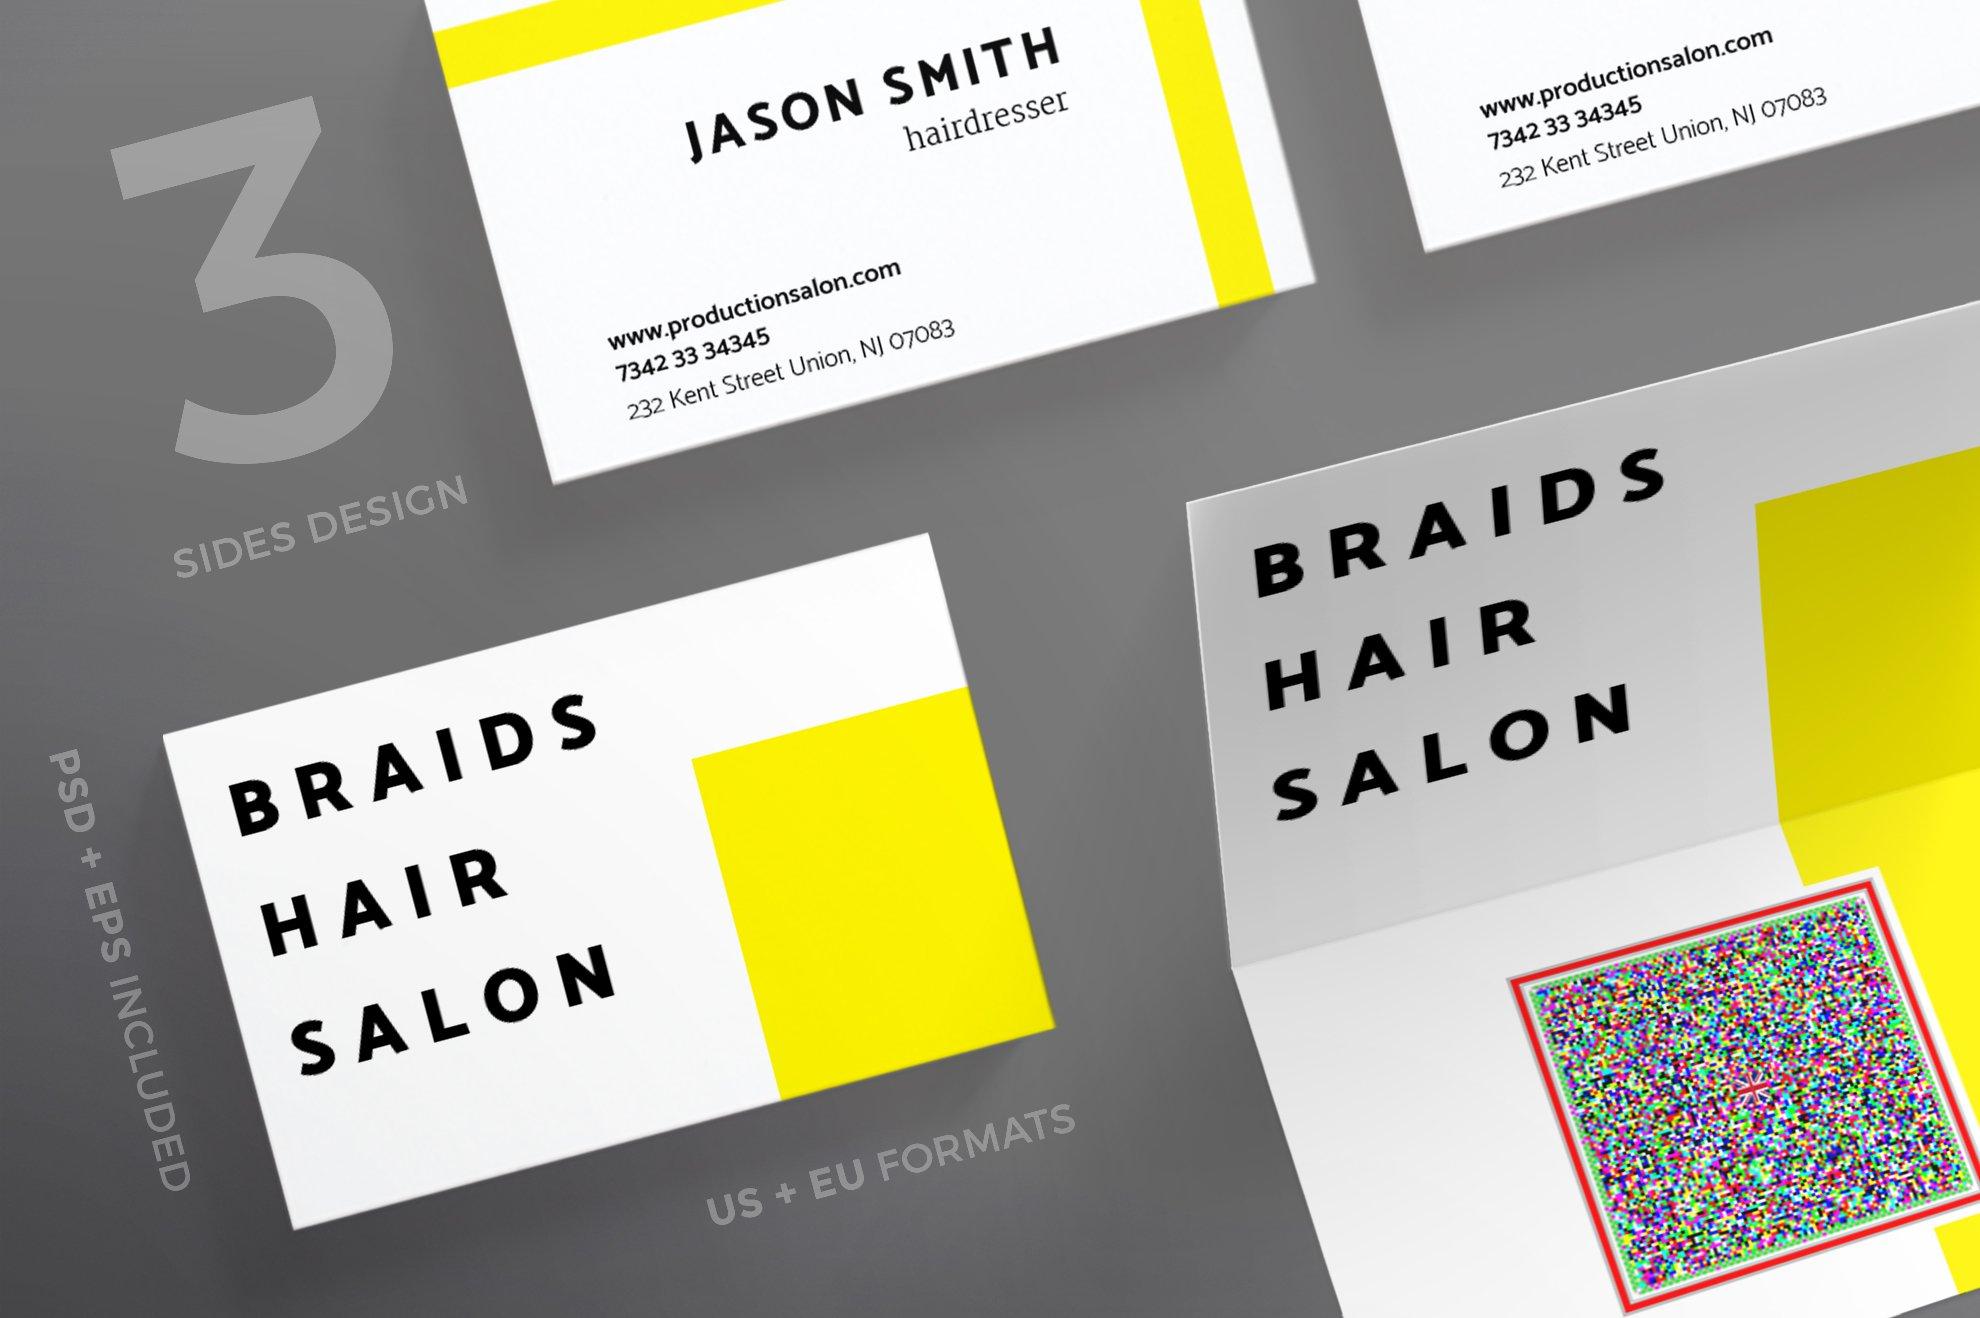 Business Cards | Braids Hair Salon ~ Business Card Templates ...